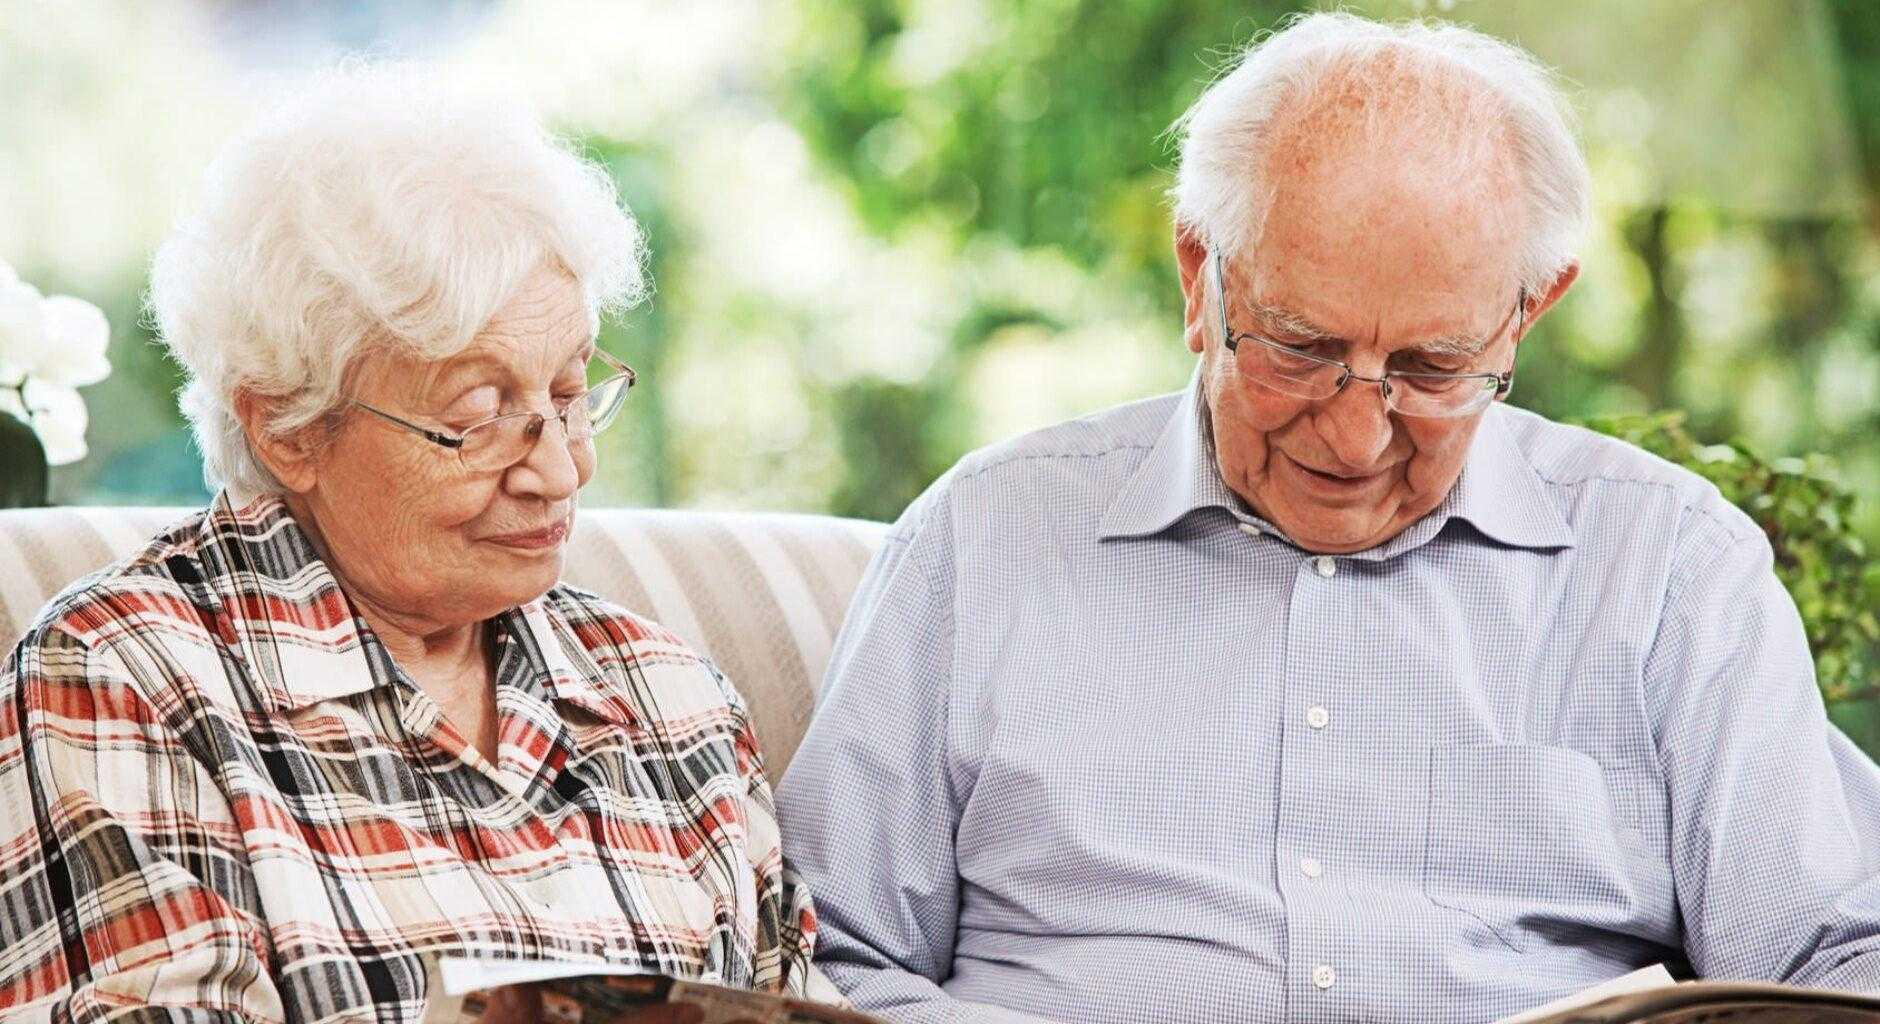 РВП для пенсионеров